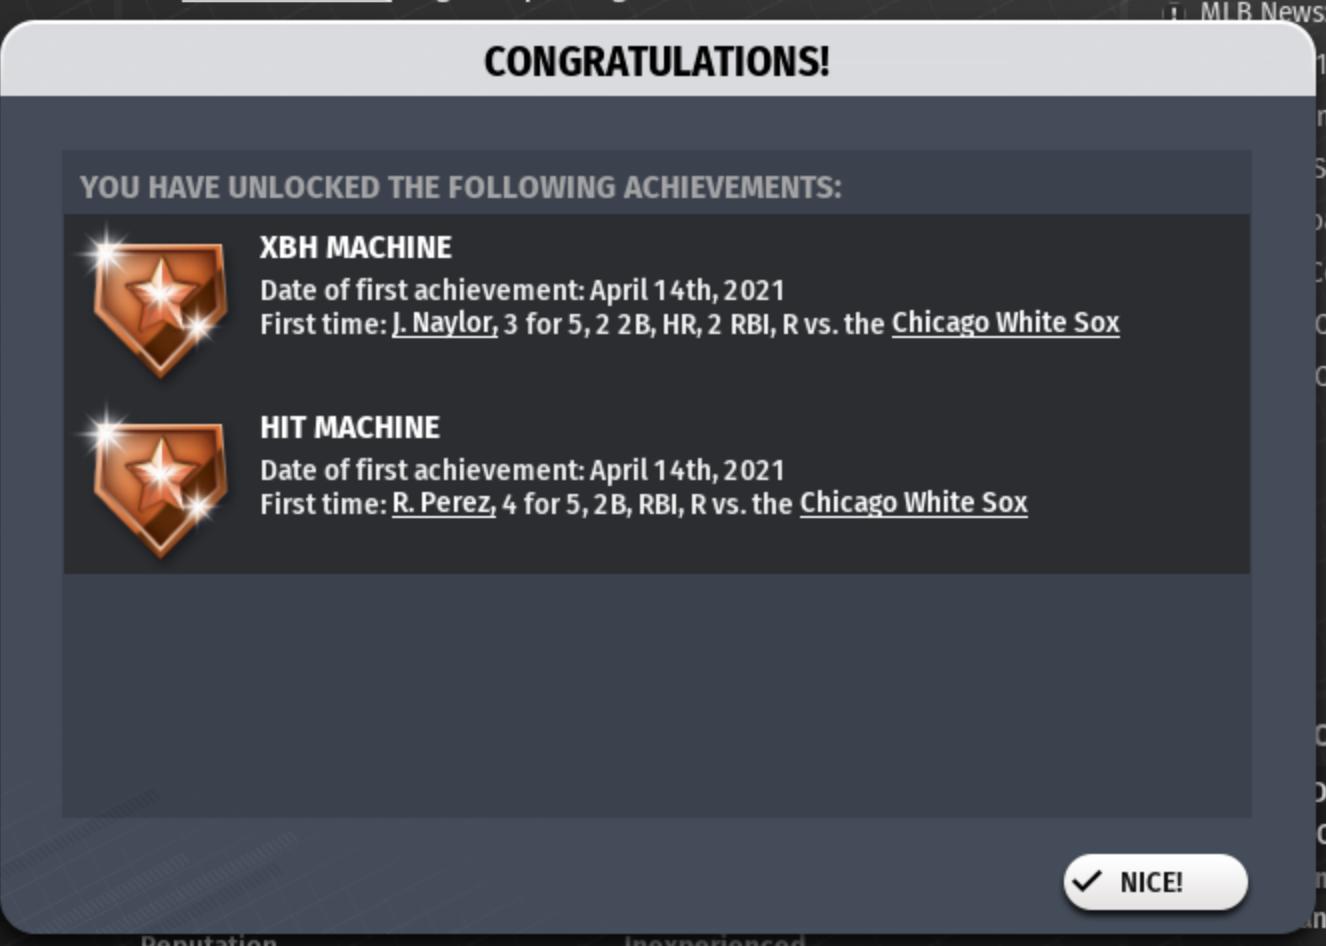 Game 11's achievements!